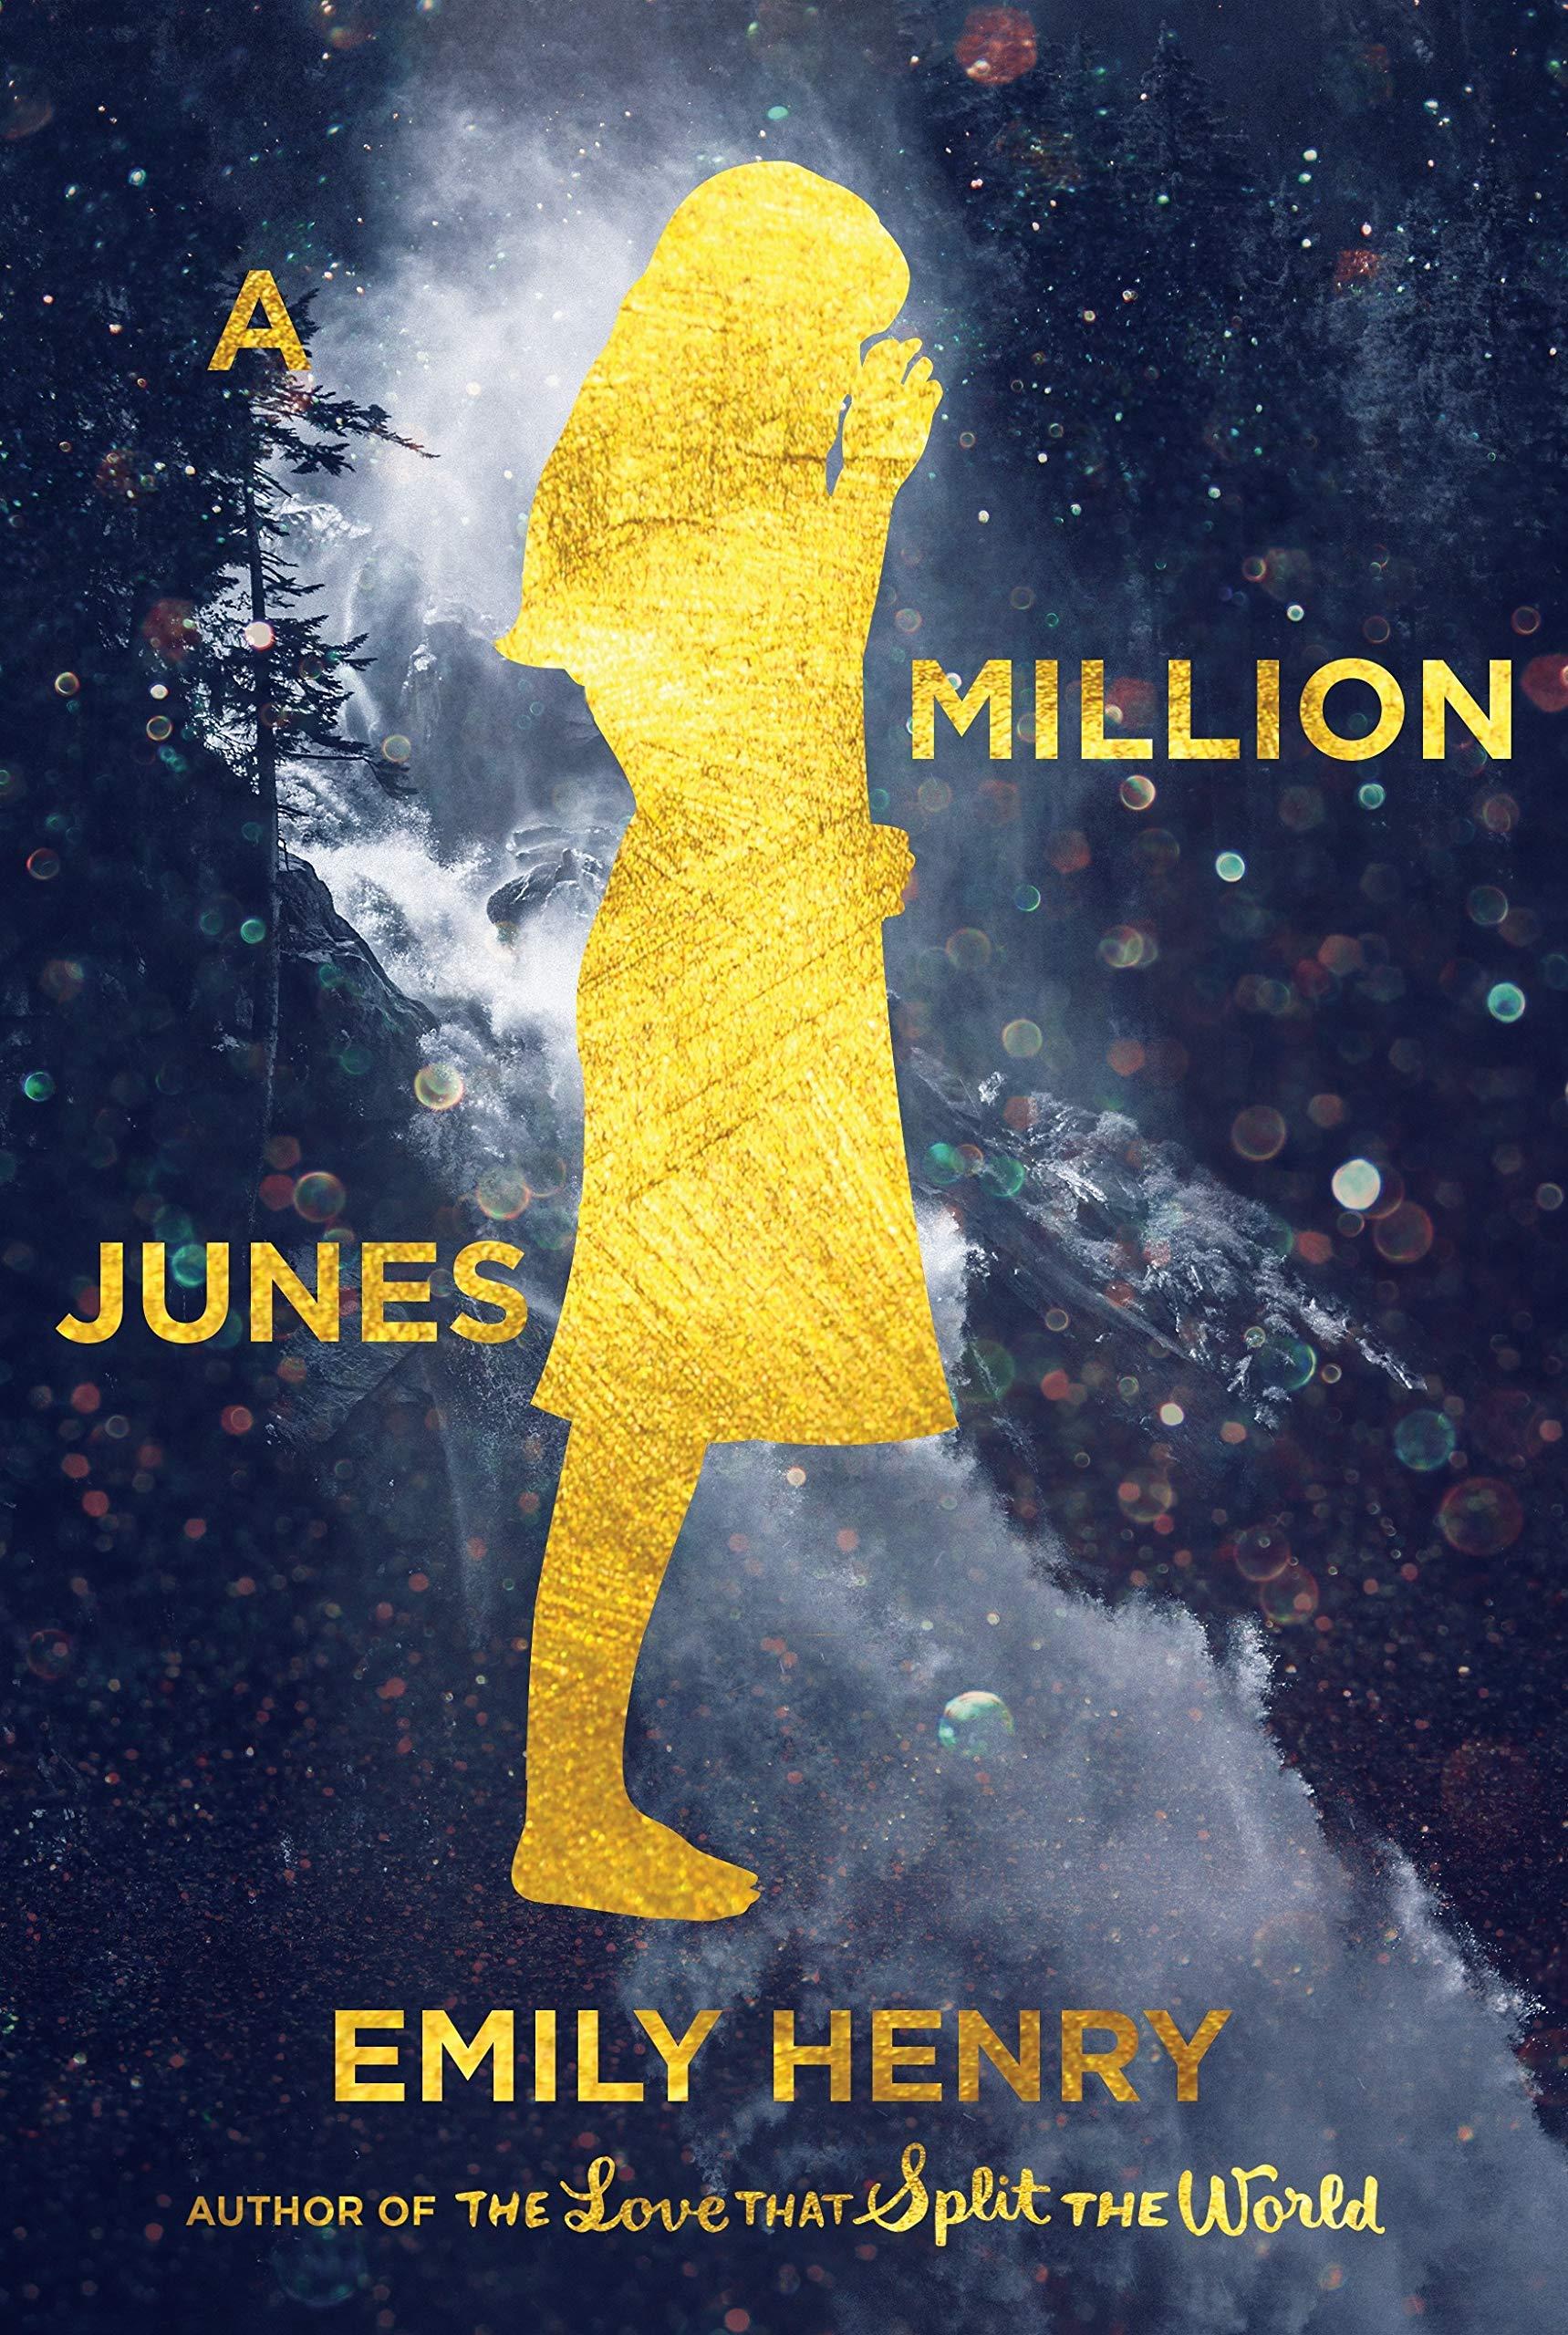 Image result for a million junes emily henry